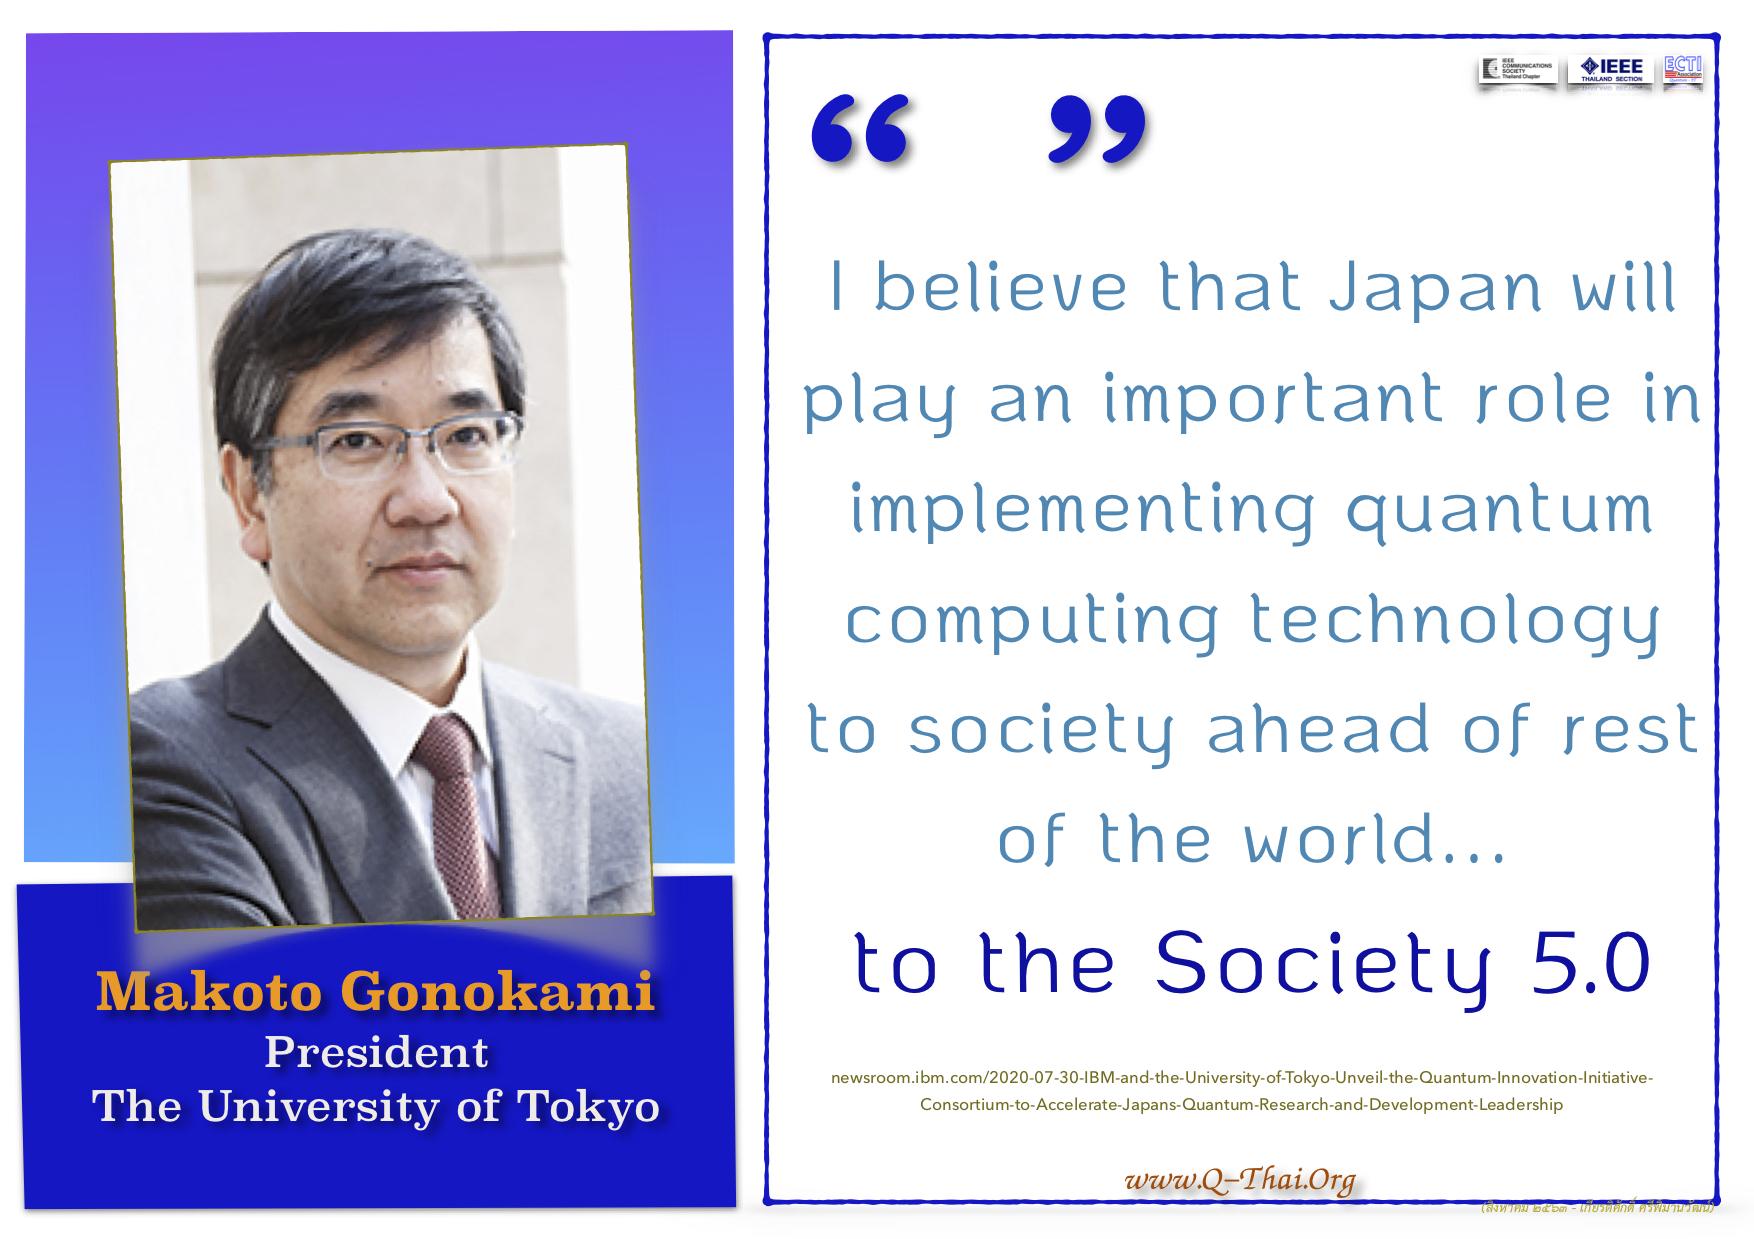 Makoto Gonokami